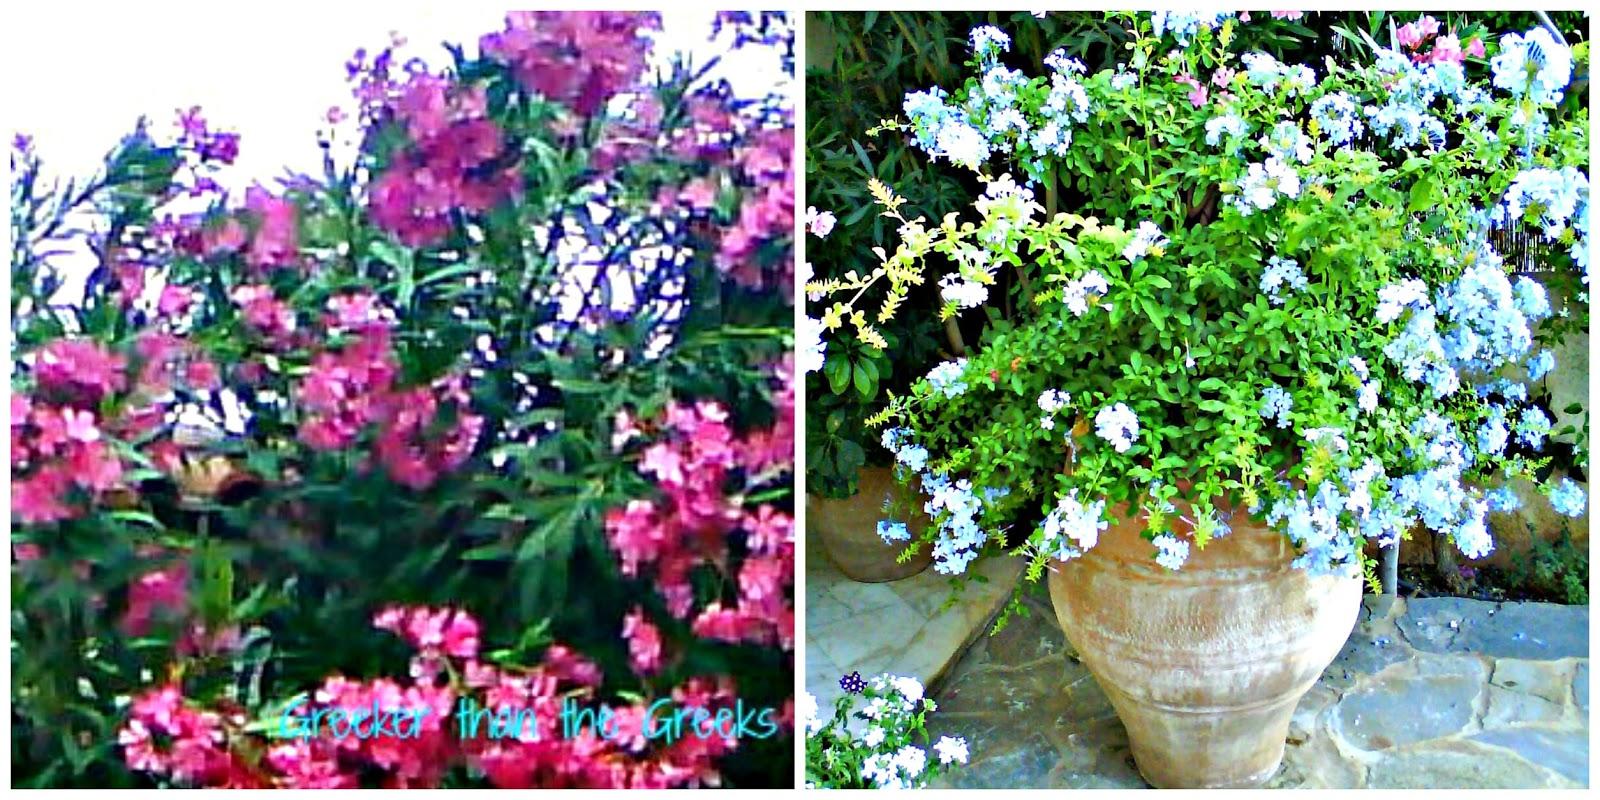 Colourful Greek flowers